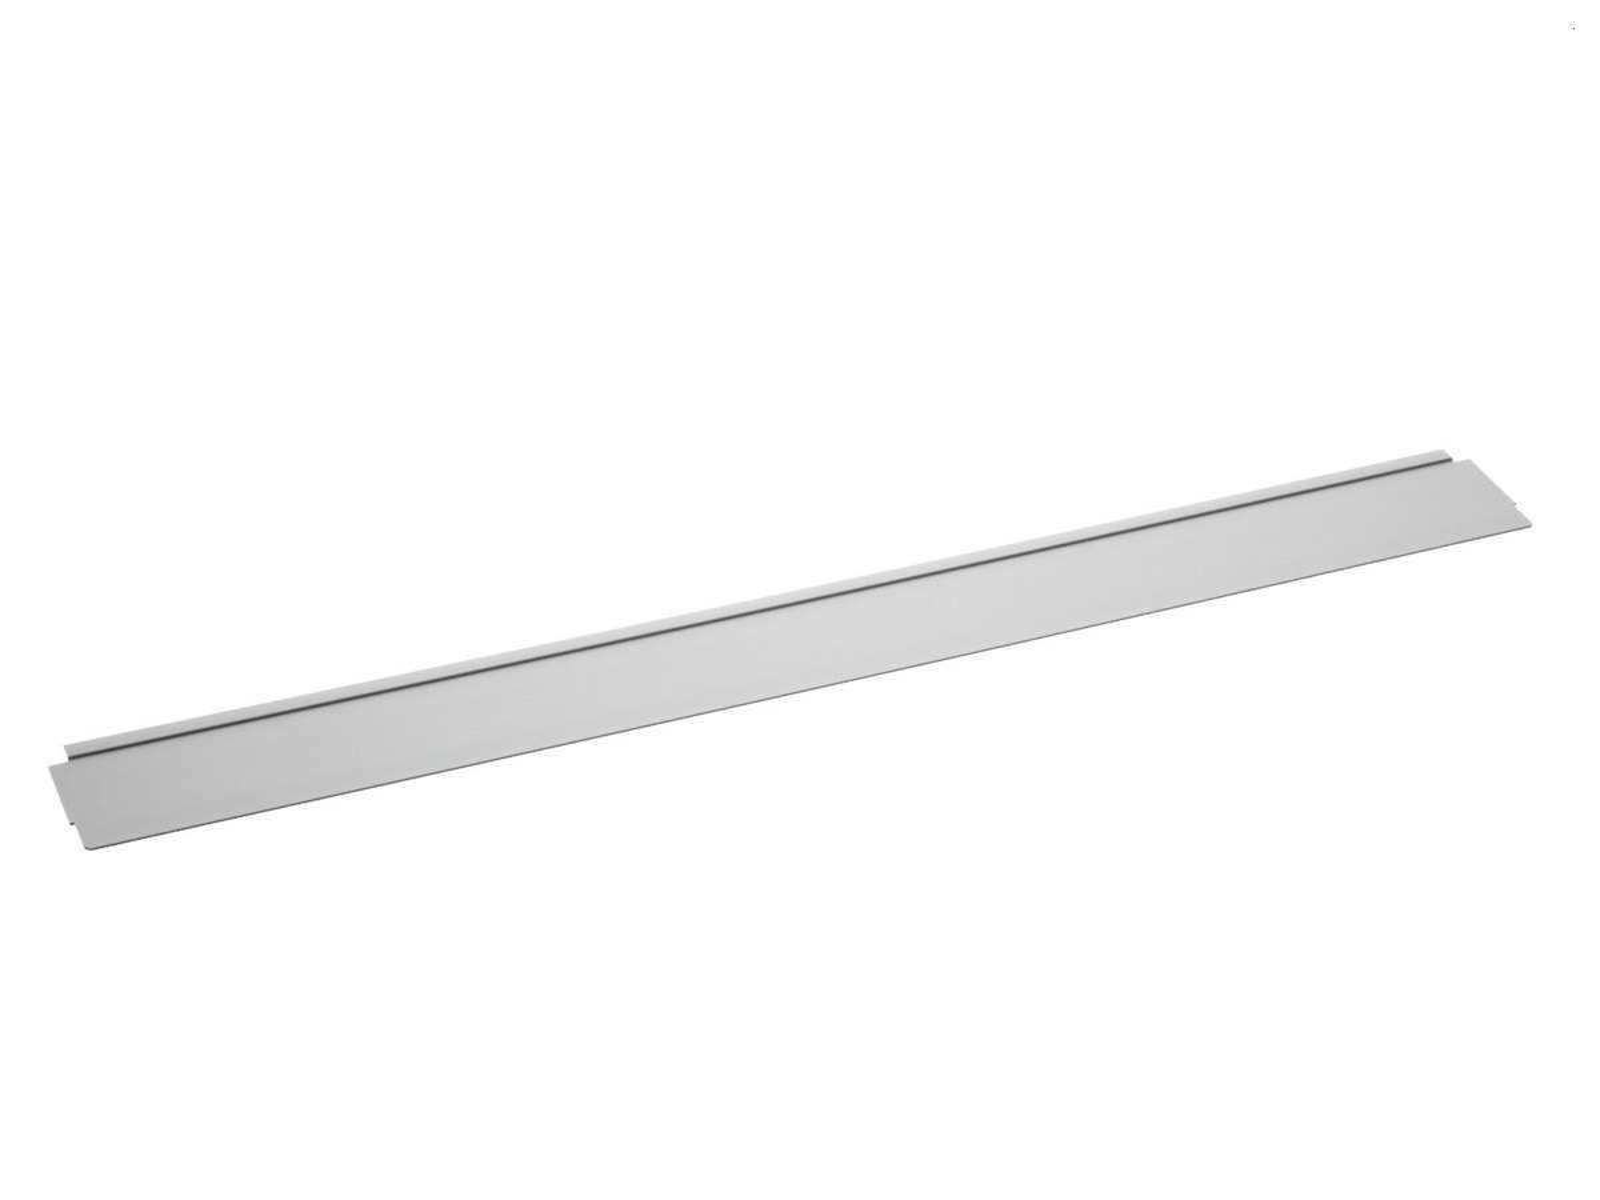 Bosch KSZ1283 Ausgleichsblende für Dekorplatten Alu matt